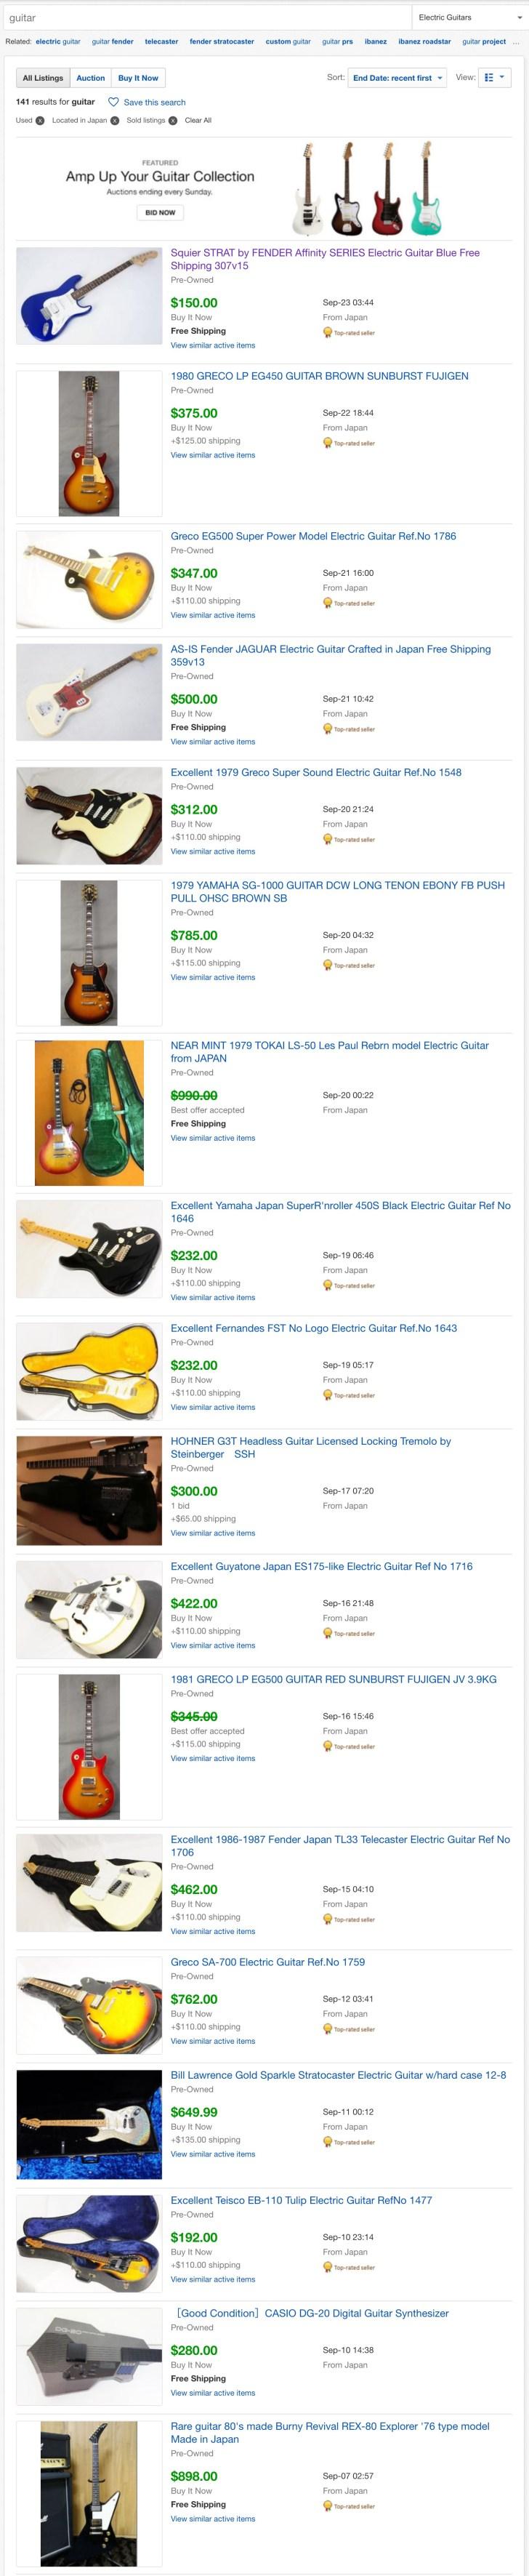 ebay楽器売れ筋